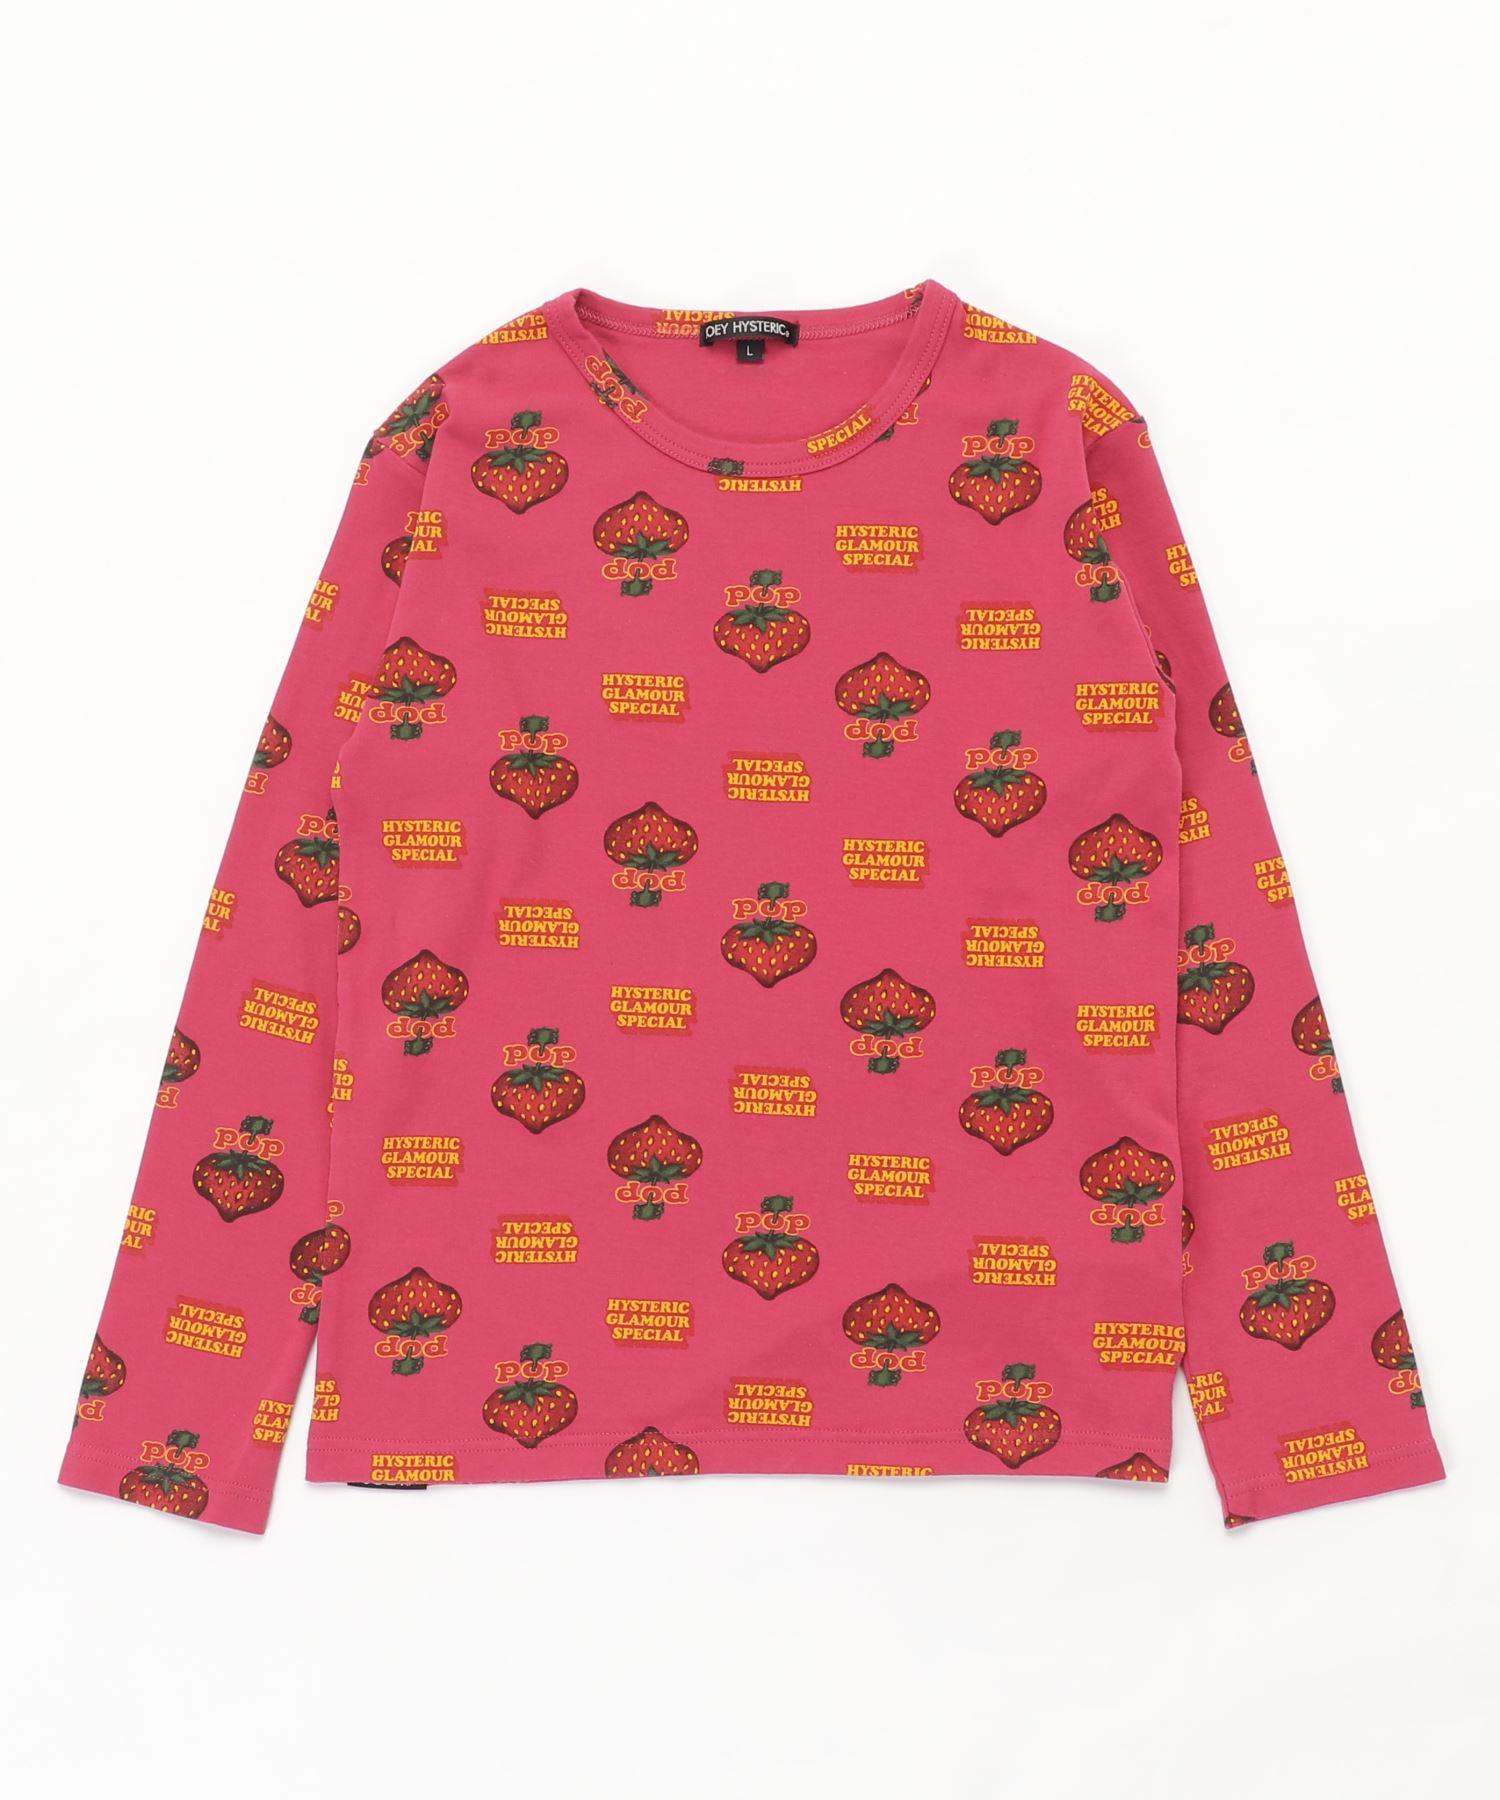 POP BERRY柄 Tシャツ【L】